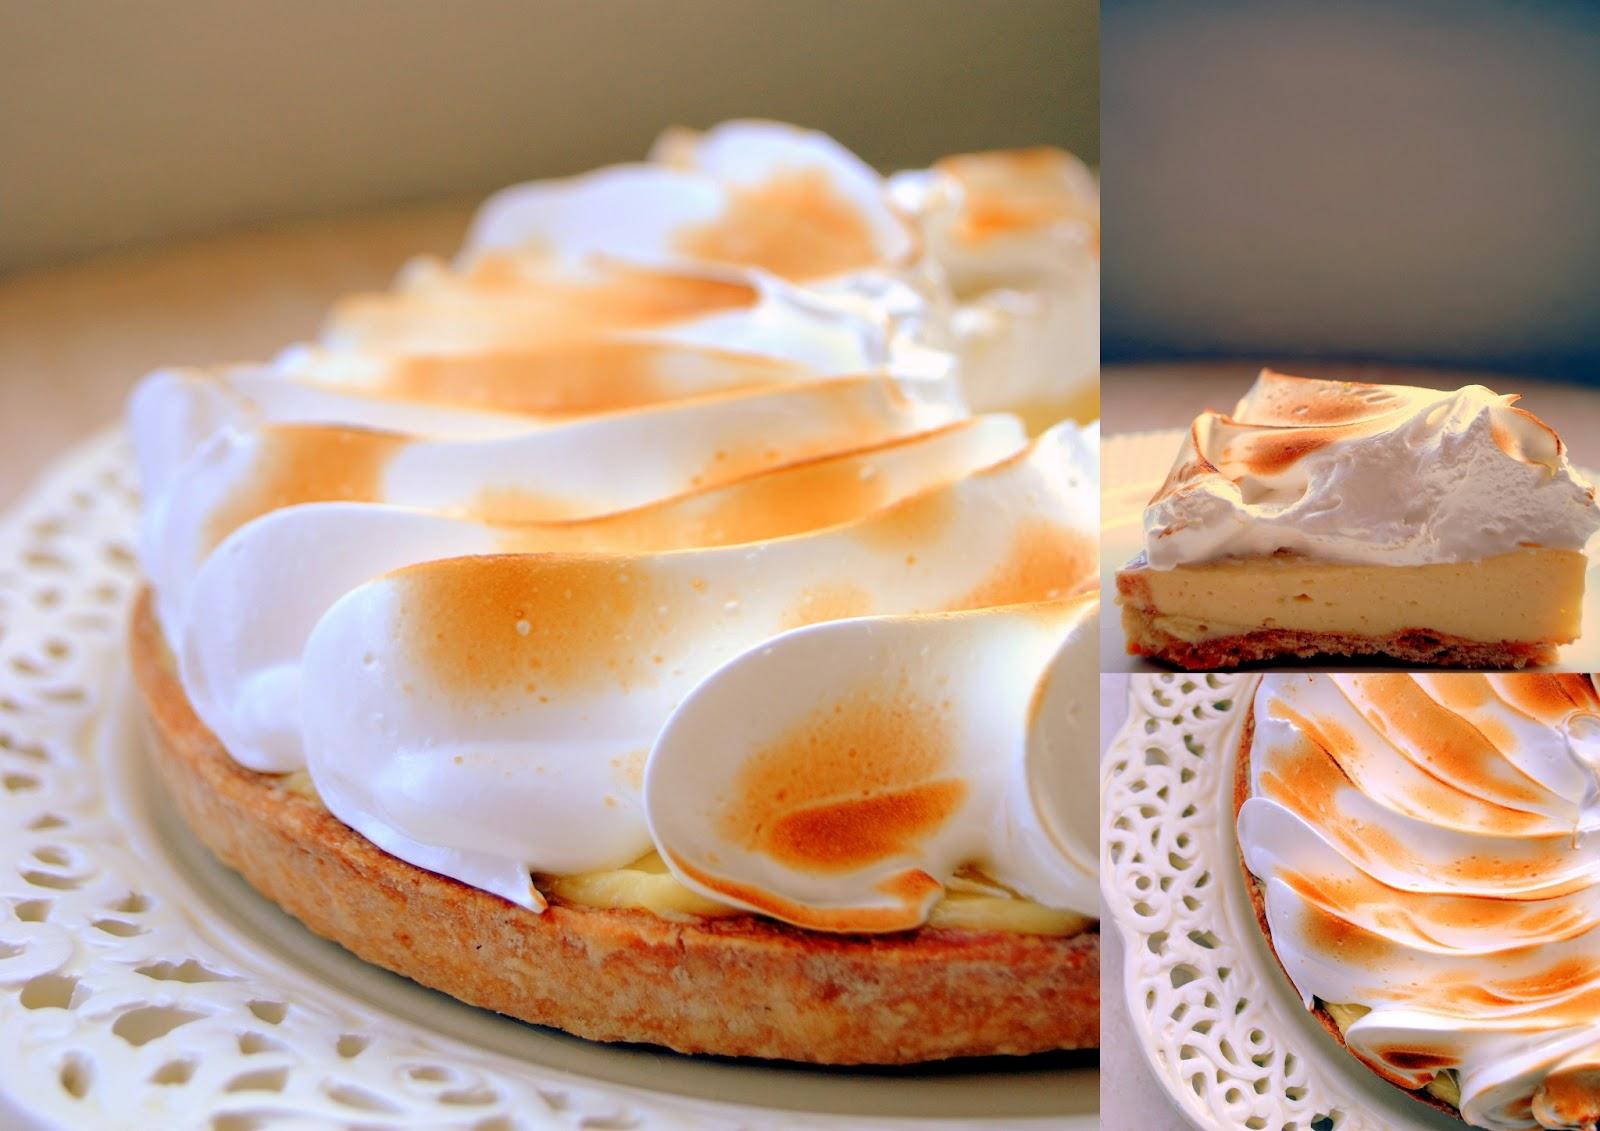 ... Cake: Tarta de Crema de Lima con Merengue (Key Lime Meringue Tart